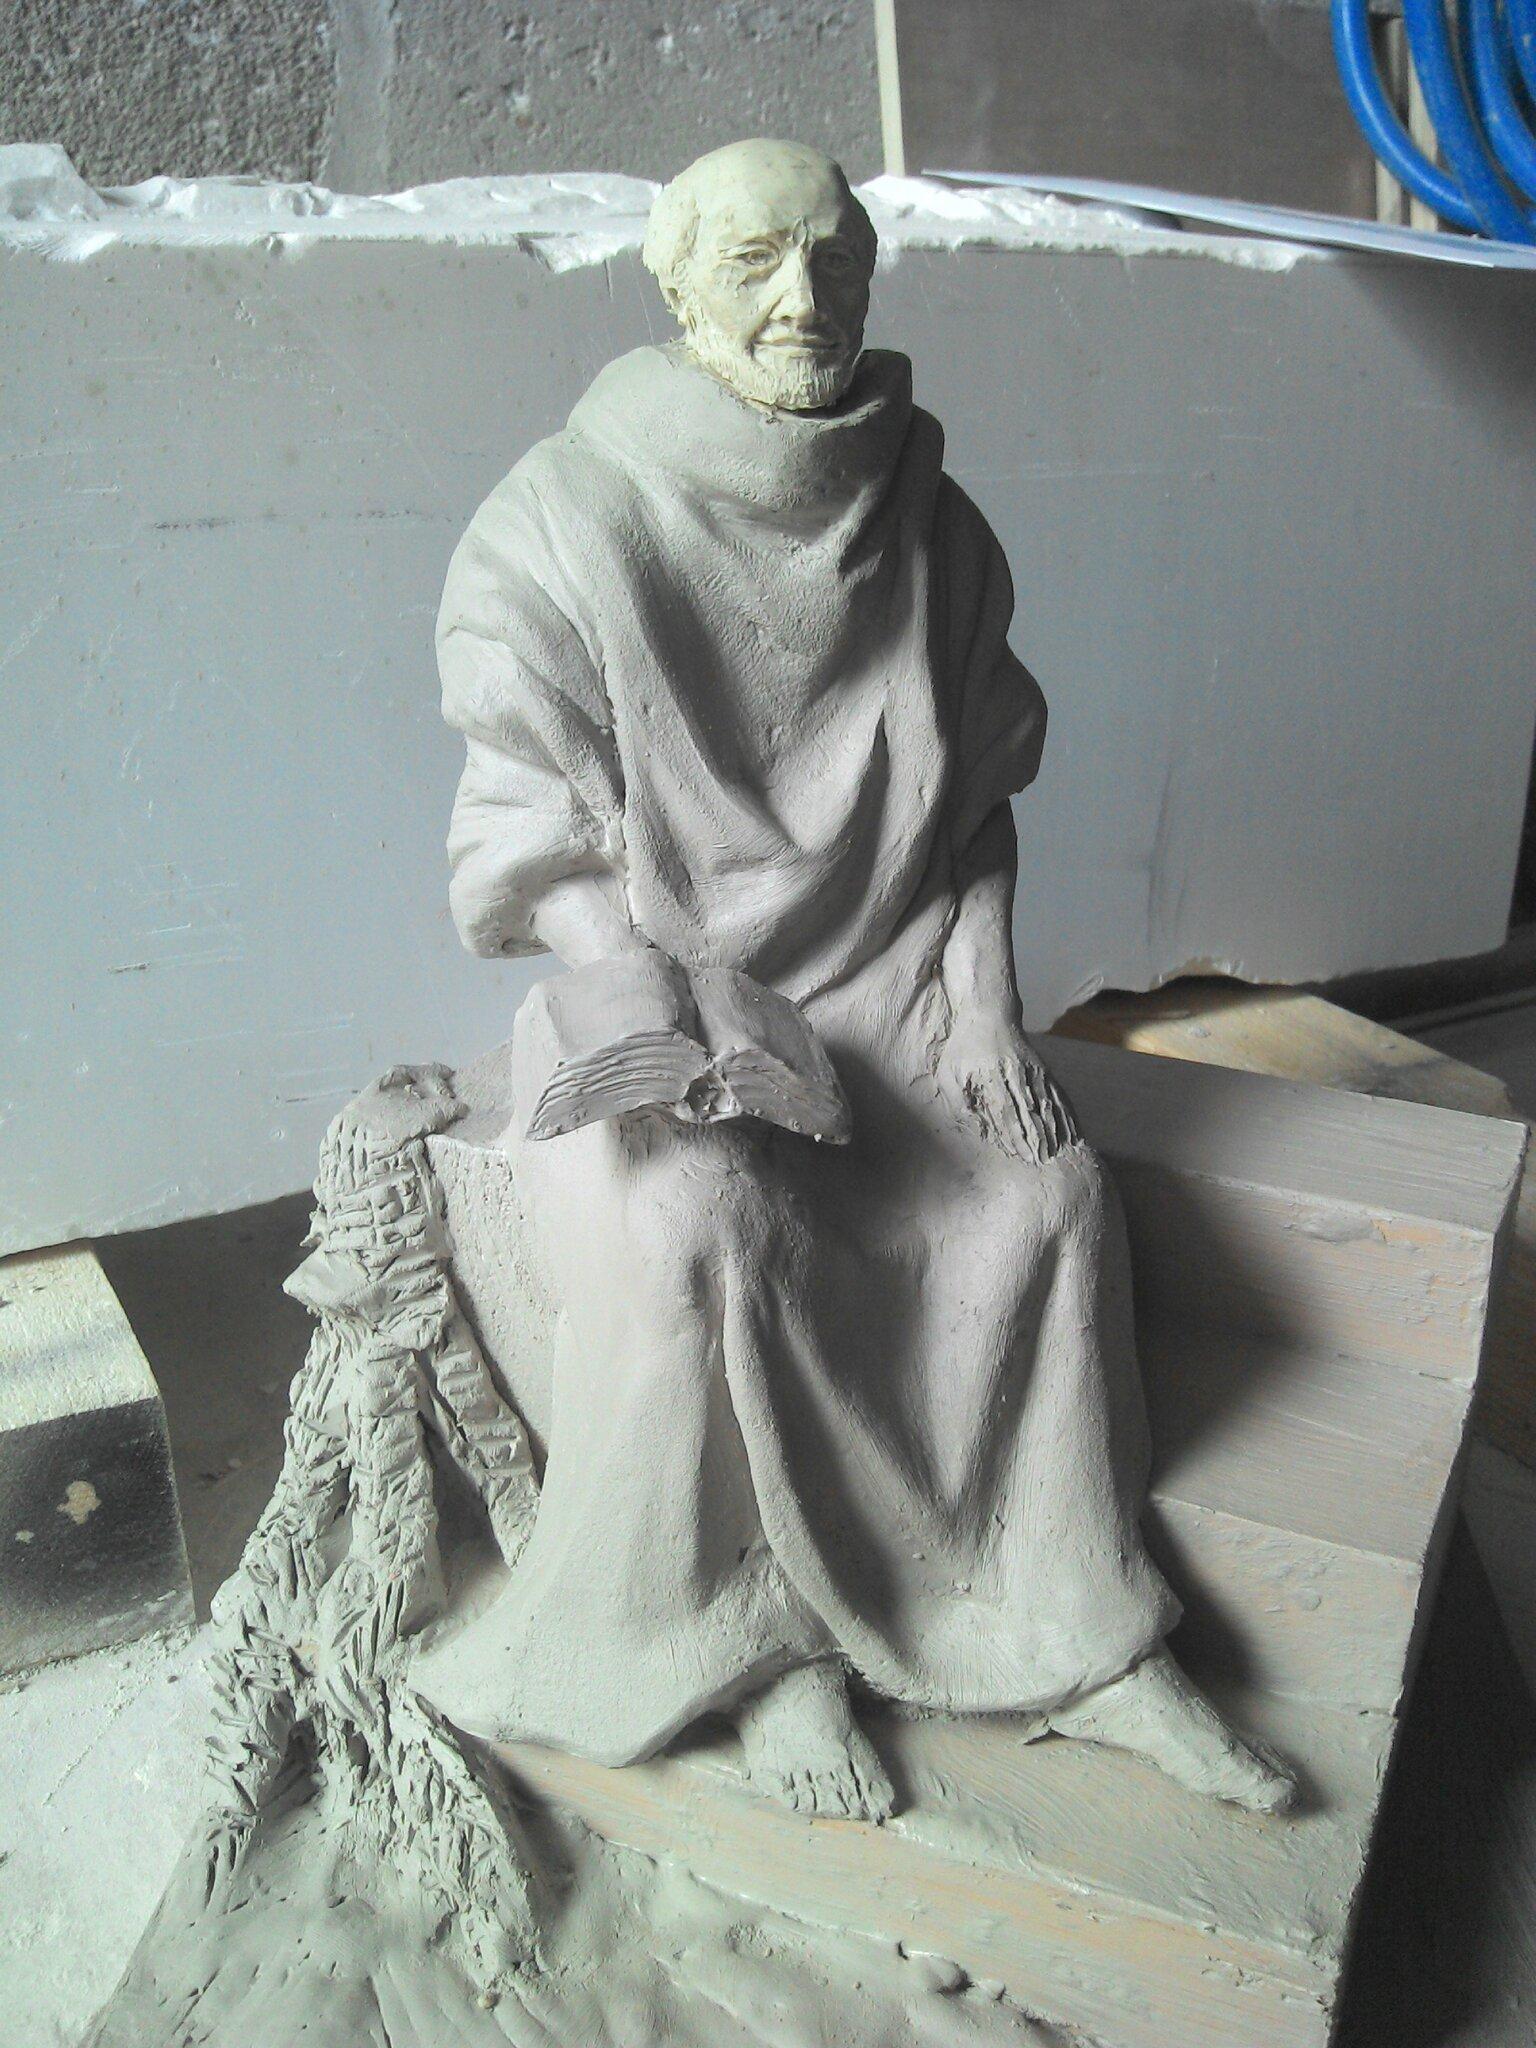 Fulbert DUBOIS sculpteur - sculpture argile